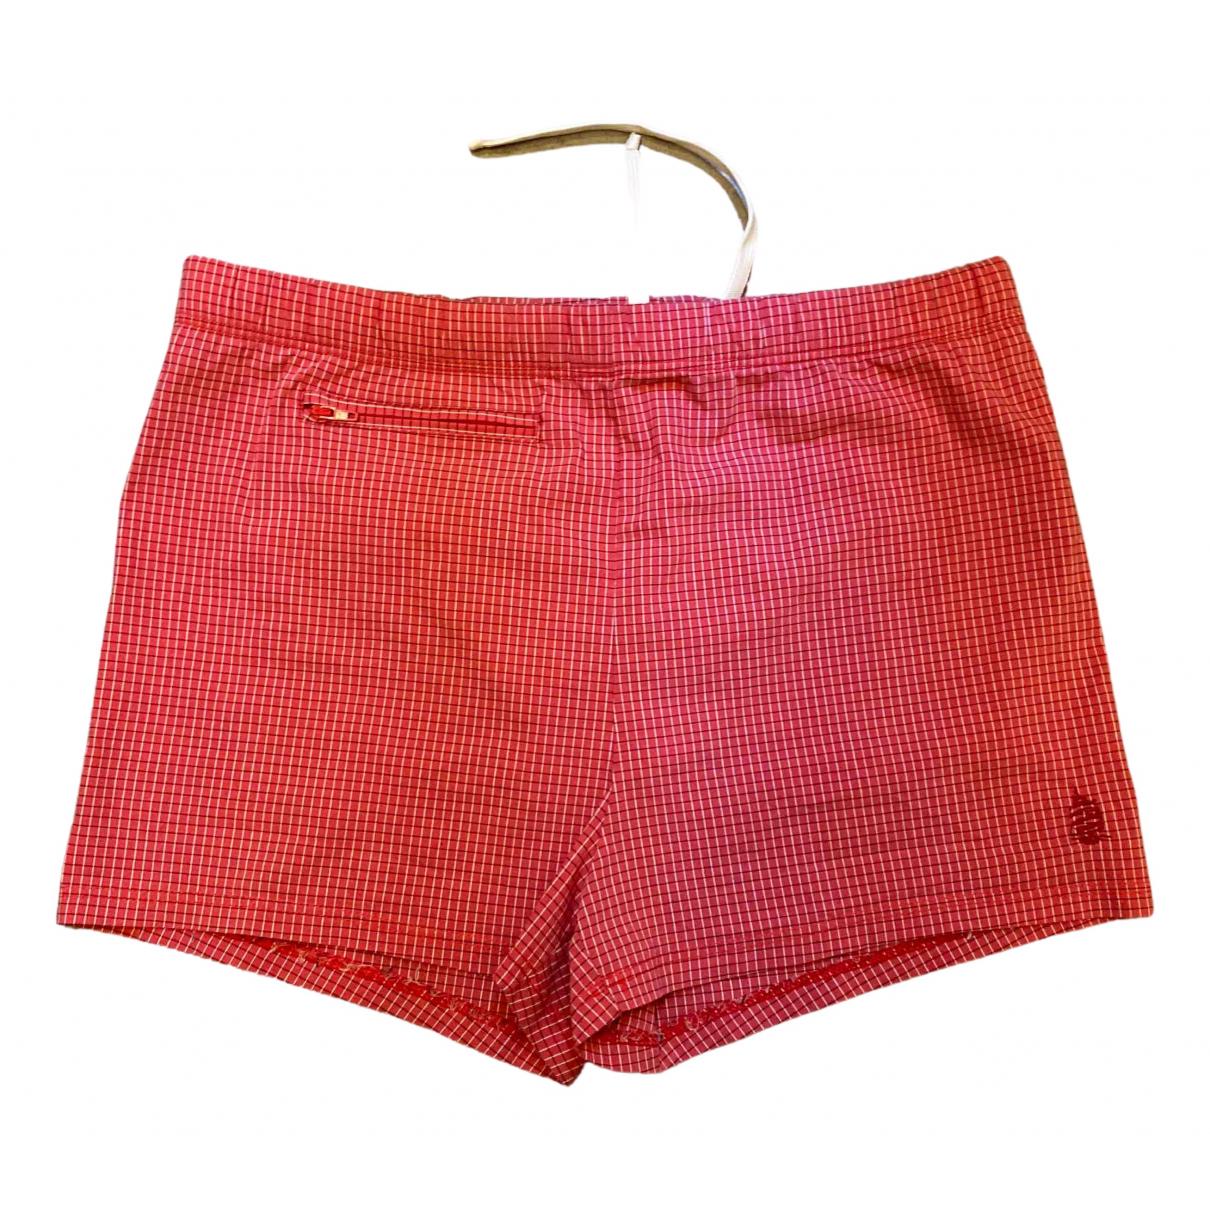 Marina Yachting - Bain   pour homme en coton - elasthane - rouge